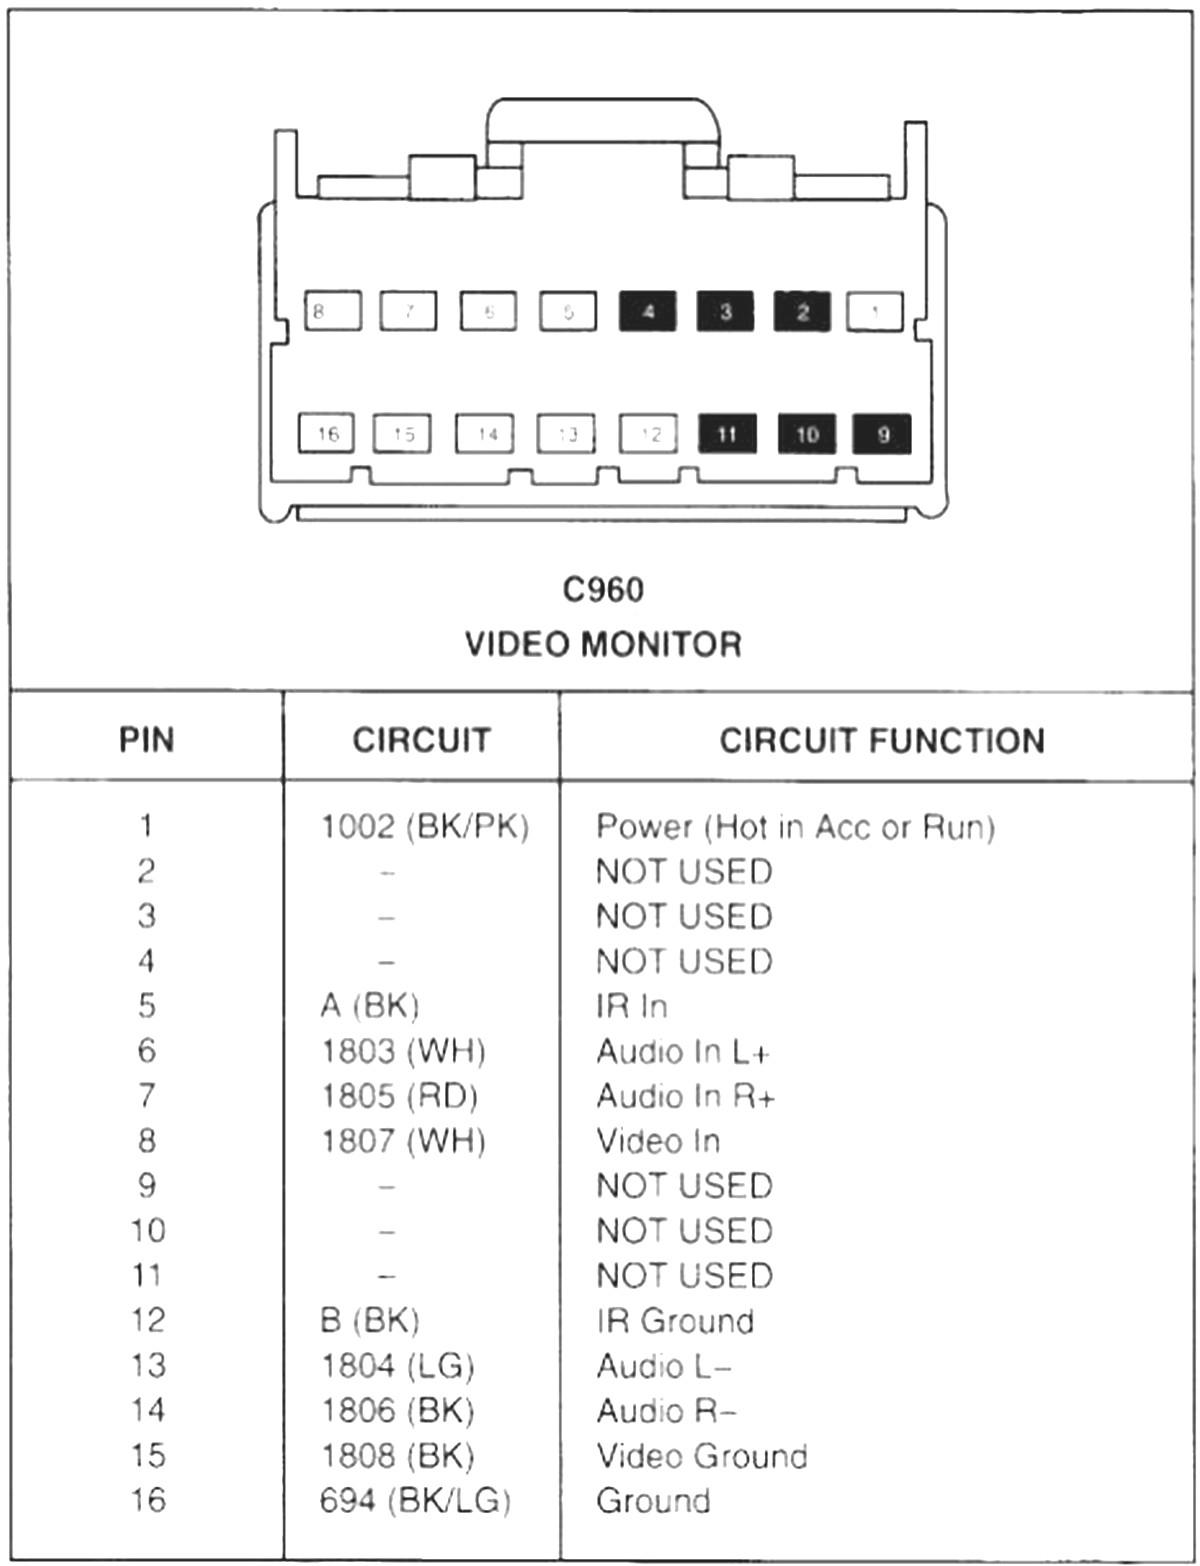 2003 mustang radio wiring diagram Download-Unique 2001 Ford Mustang Radio Wiring Diagram New Update In 5-f